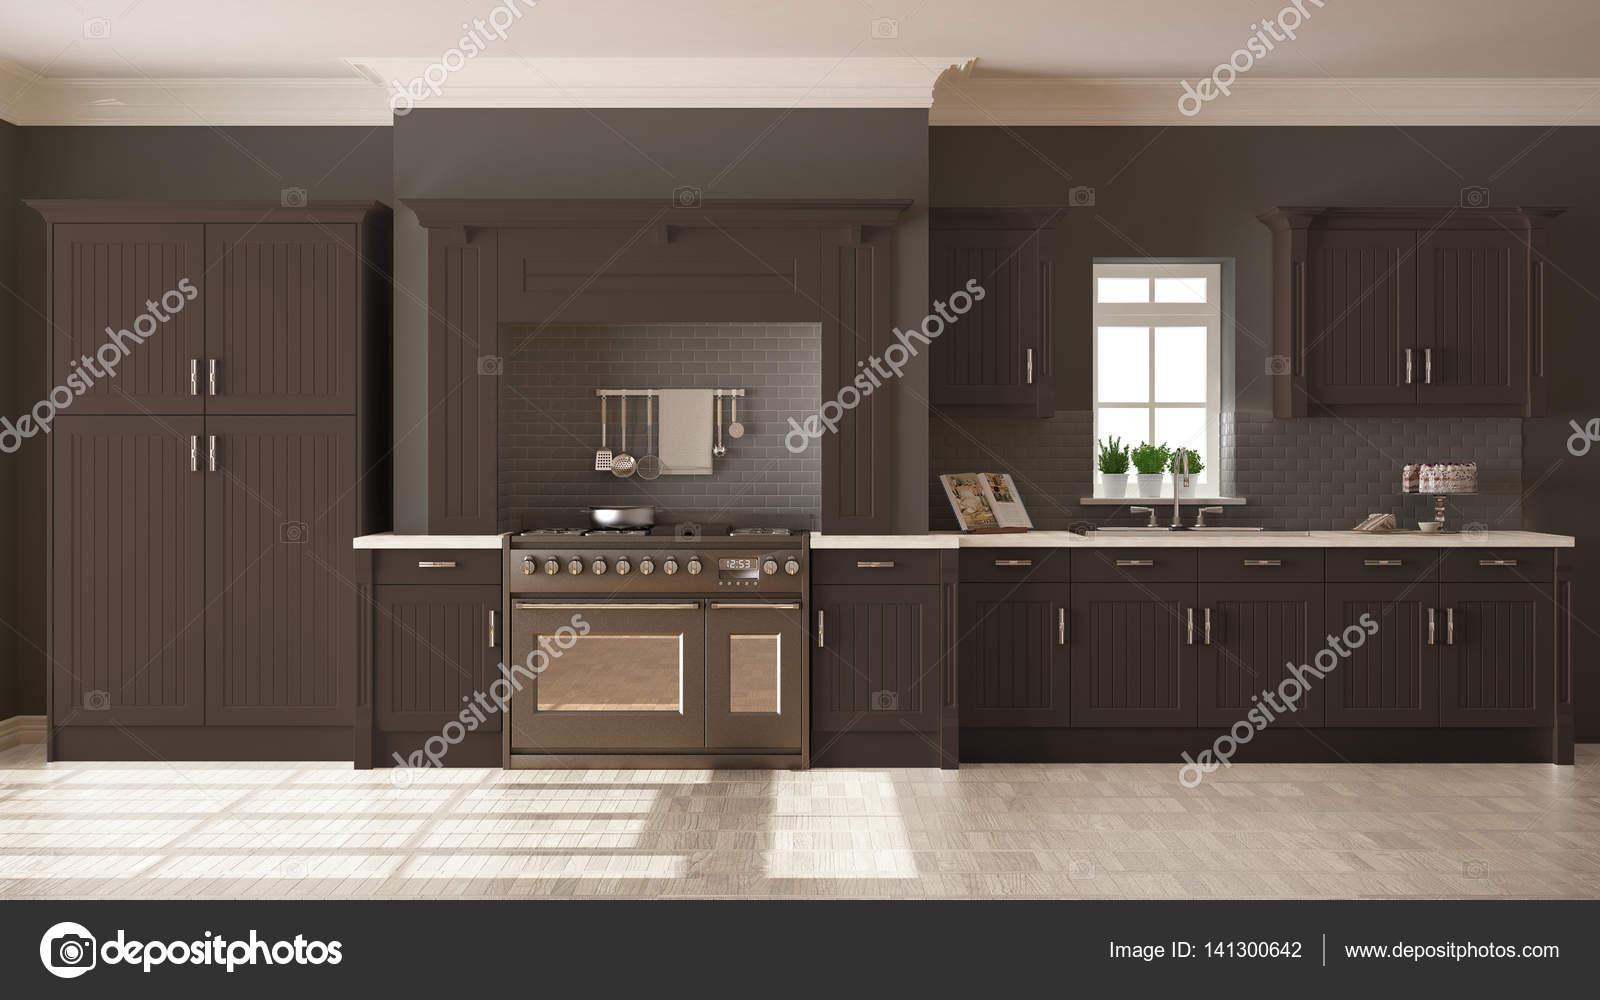 Classic Kitchen Scandinavian Minimal Interior Design With Woode Stock Photo C Archiviz 141300642